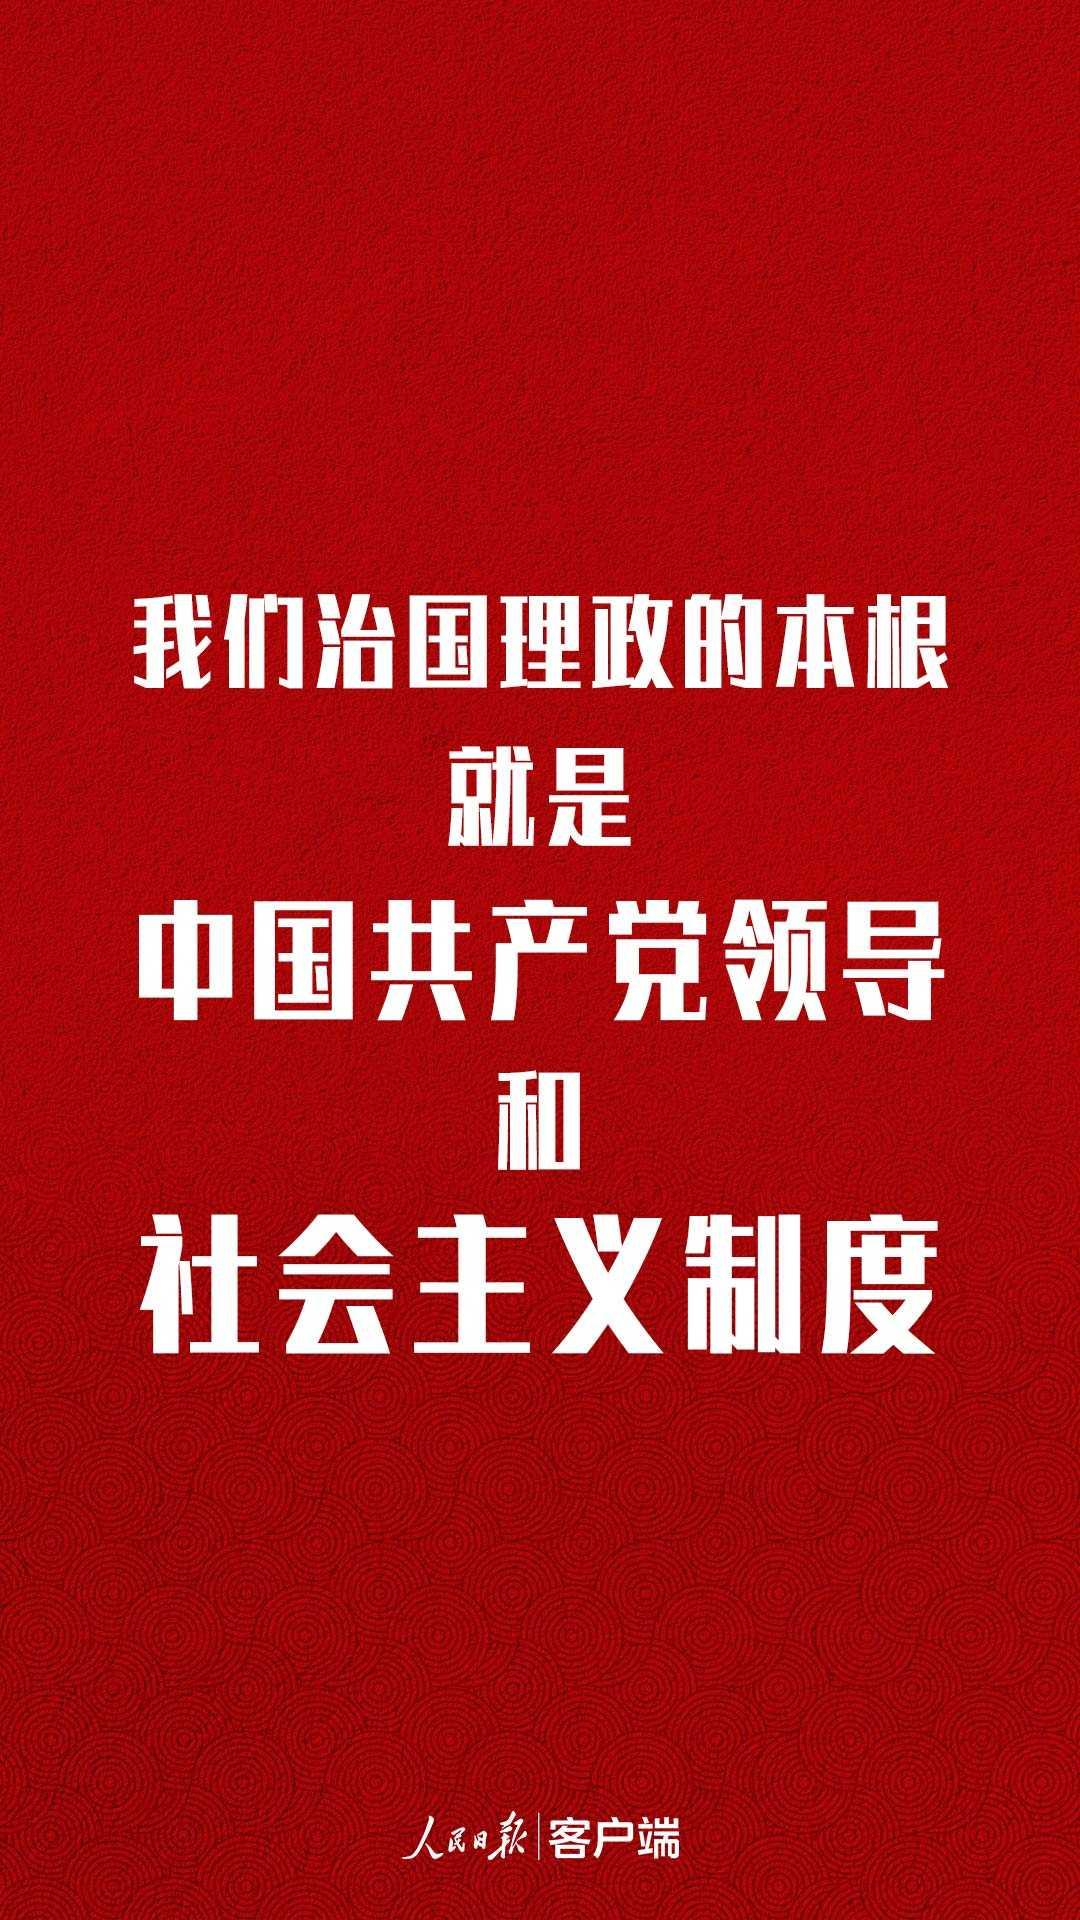 3.jpg?x-oss-process=style/w10